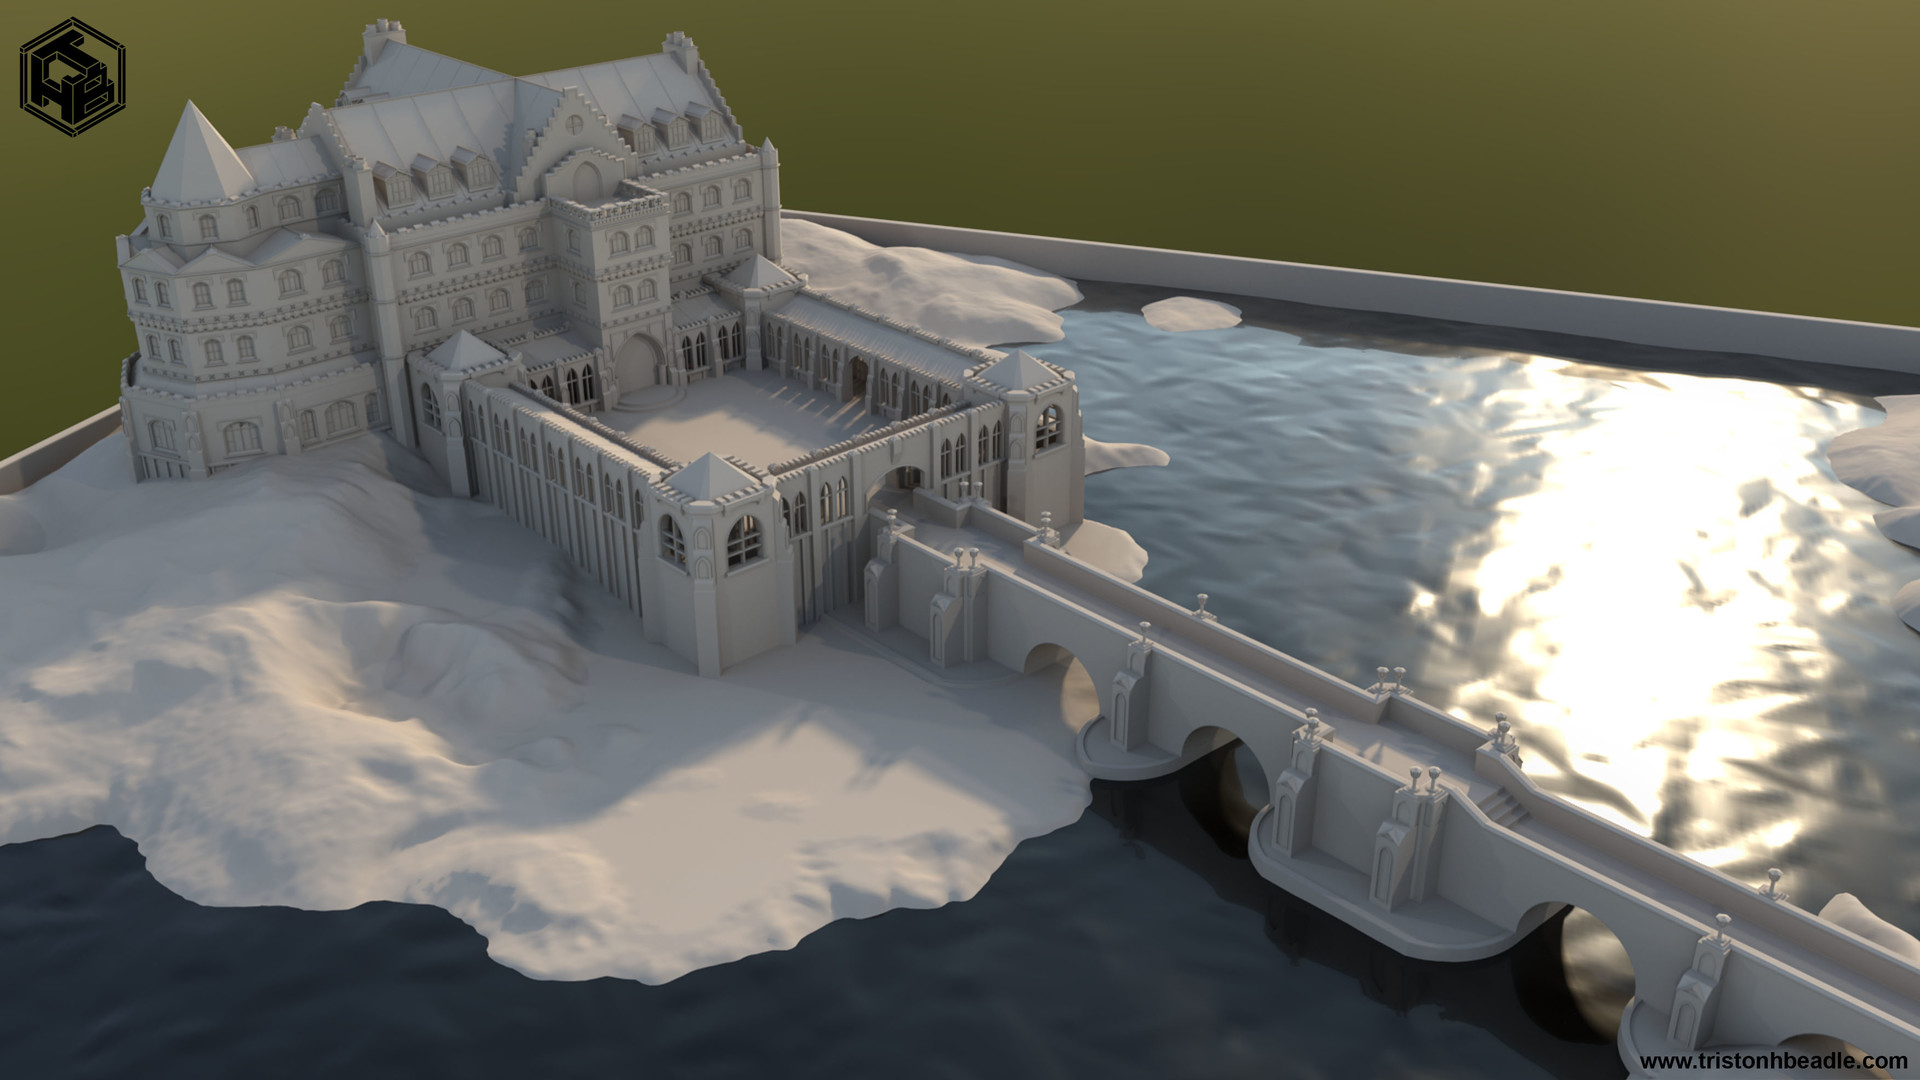 Triston beadle castle 01